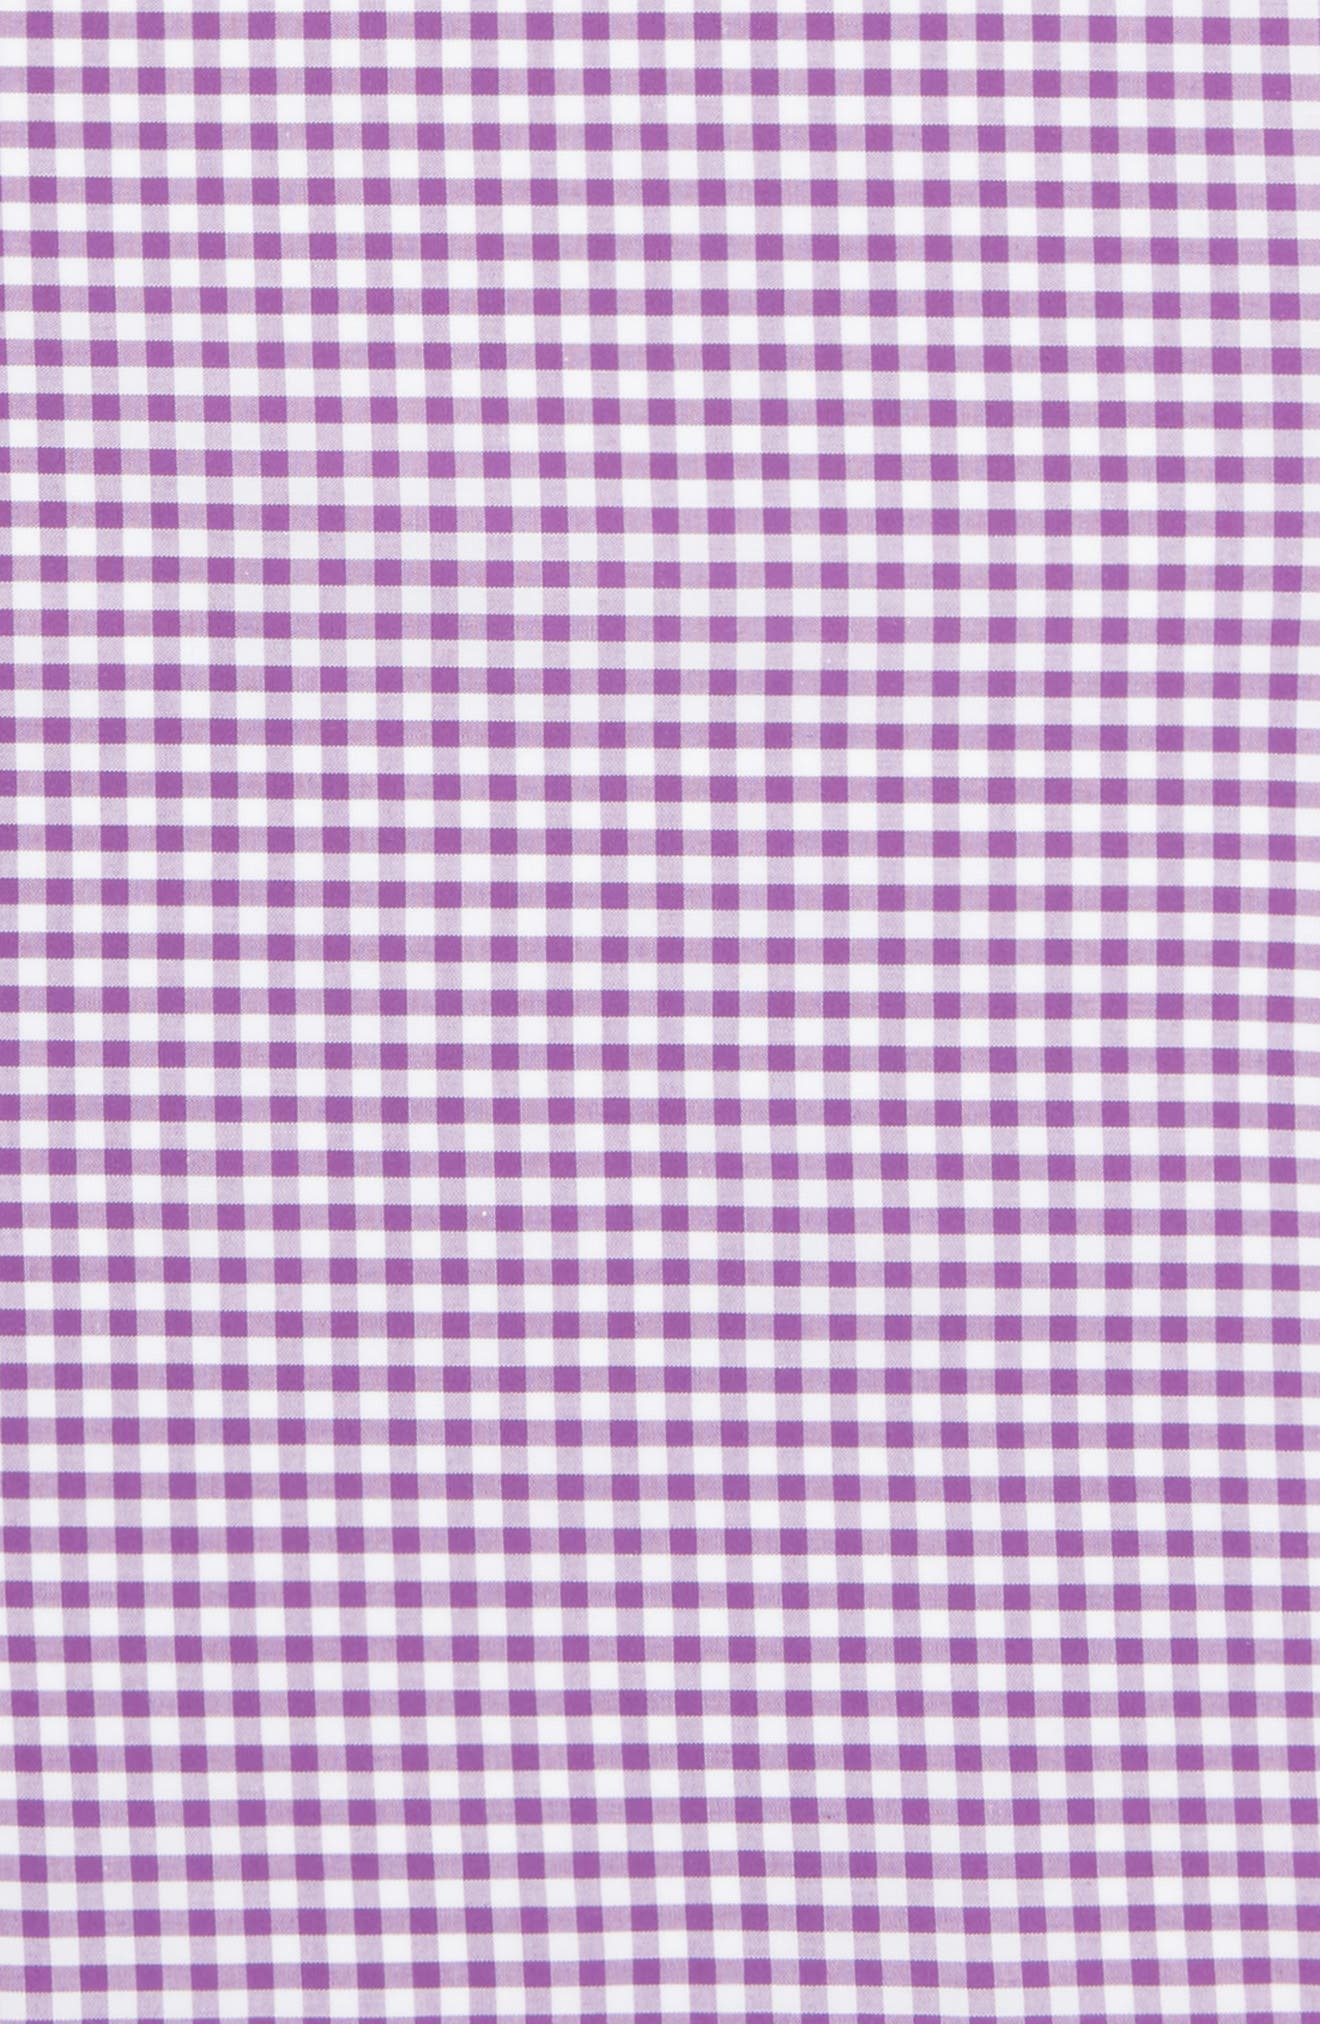 Novel Check Cotton Pocket Square,                             Alternate thumbnail 3, color,                             Plum